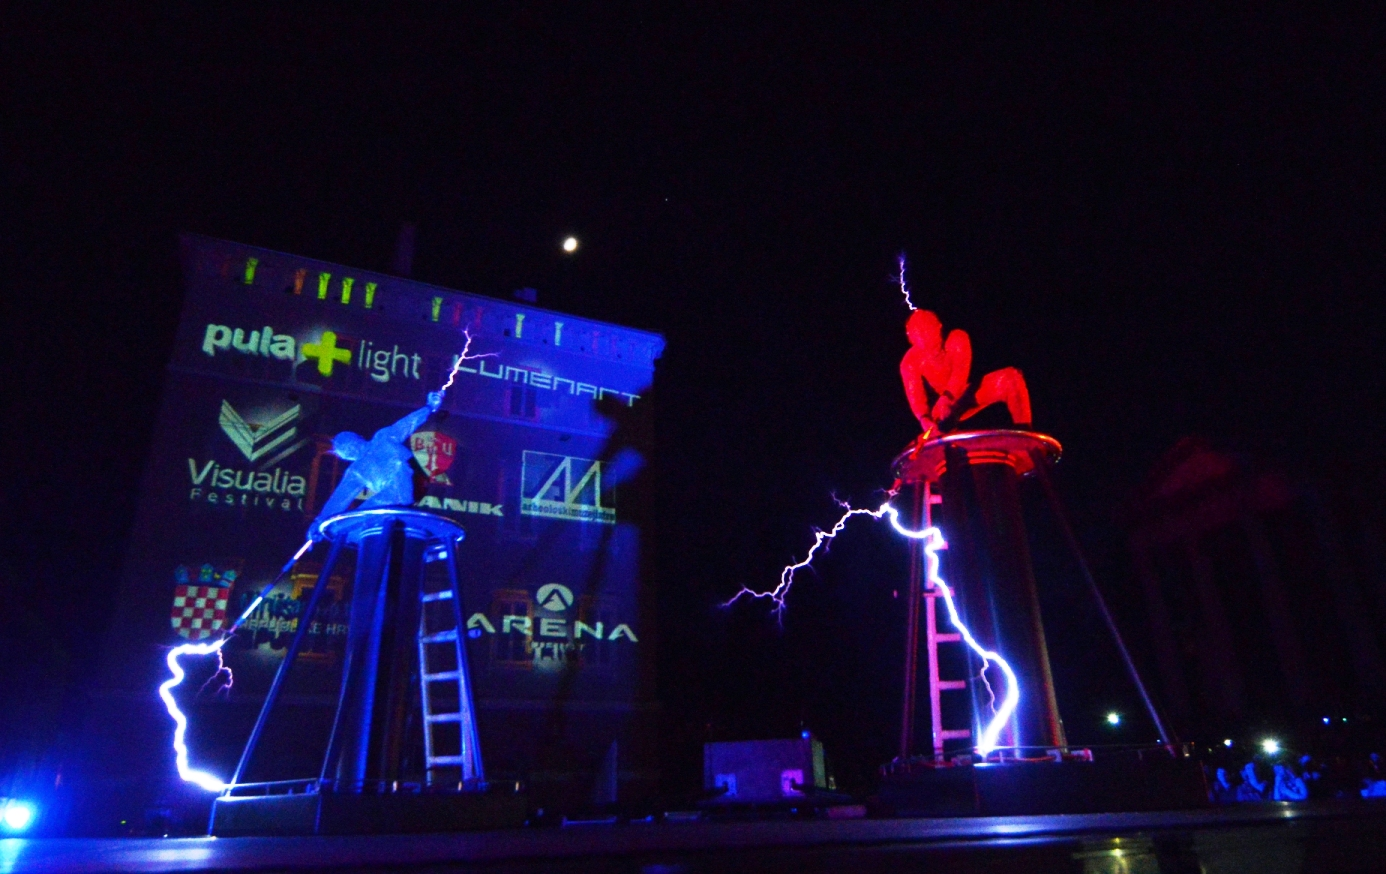 Lords of Lightning_Visualia Festival 2014_srecko niketic